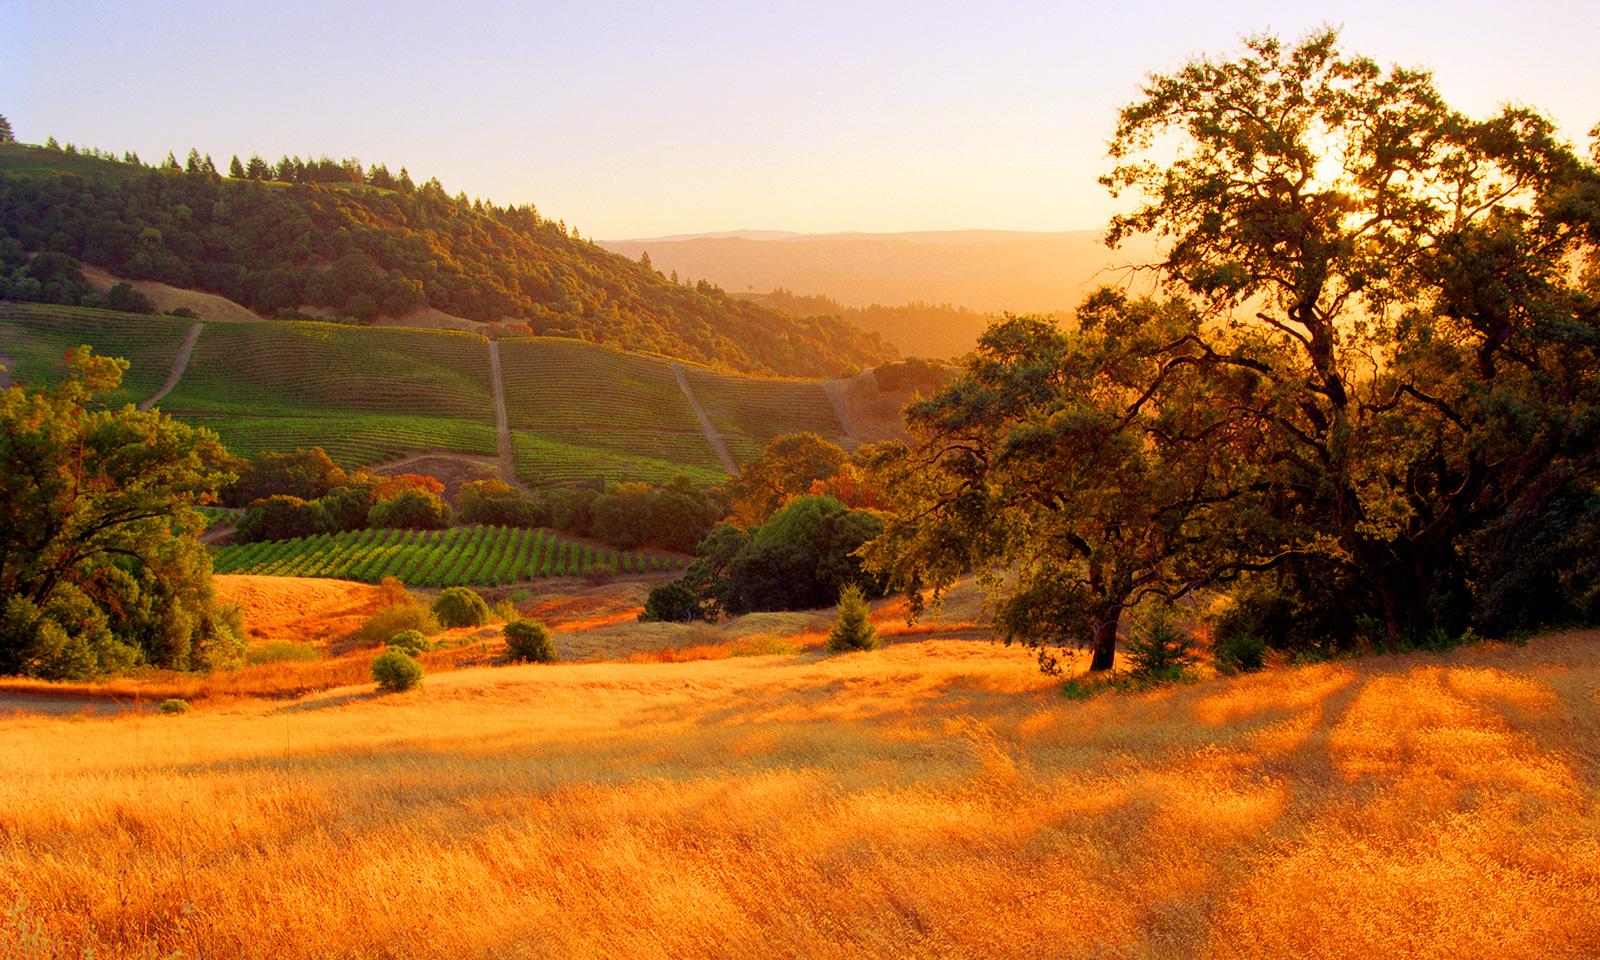 Sonoma Wine Vineyards